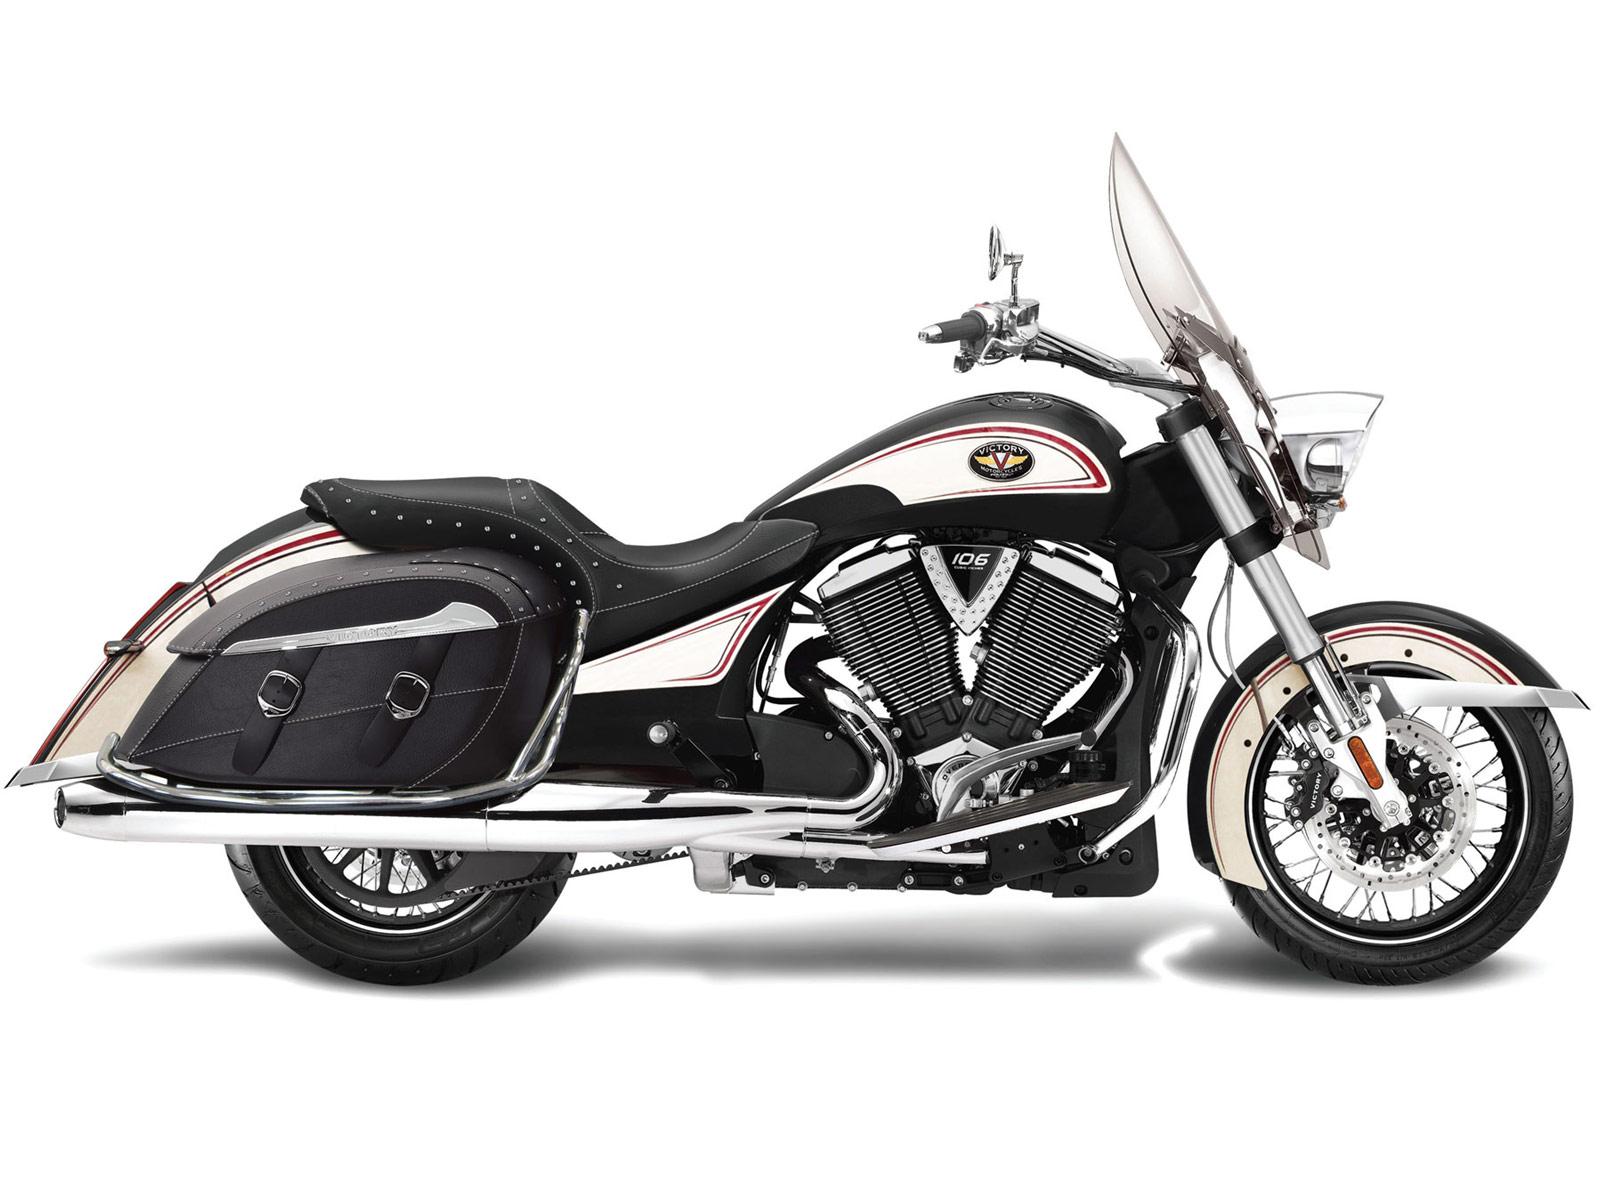 Victory Motorcycles Wallpaper - WallpaperSafari